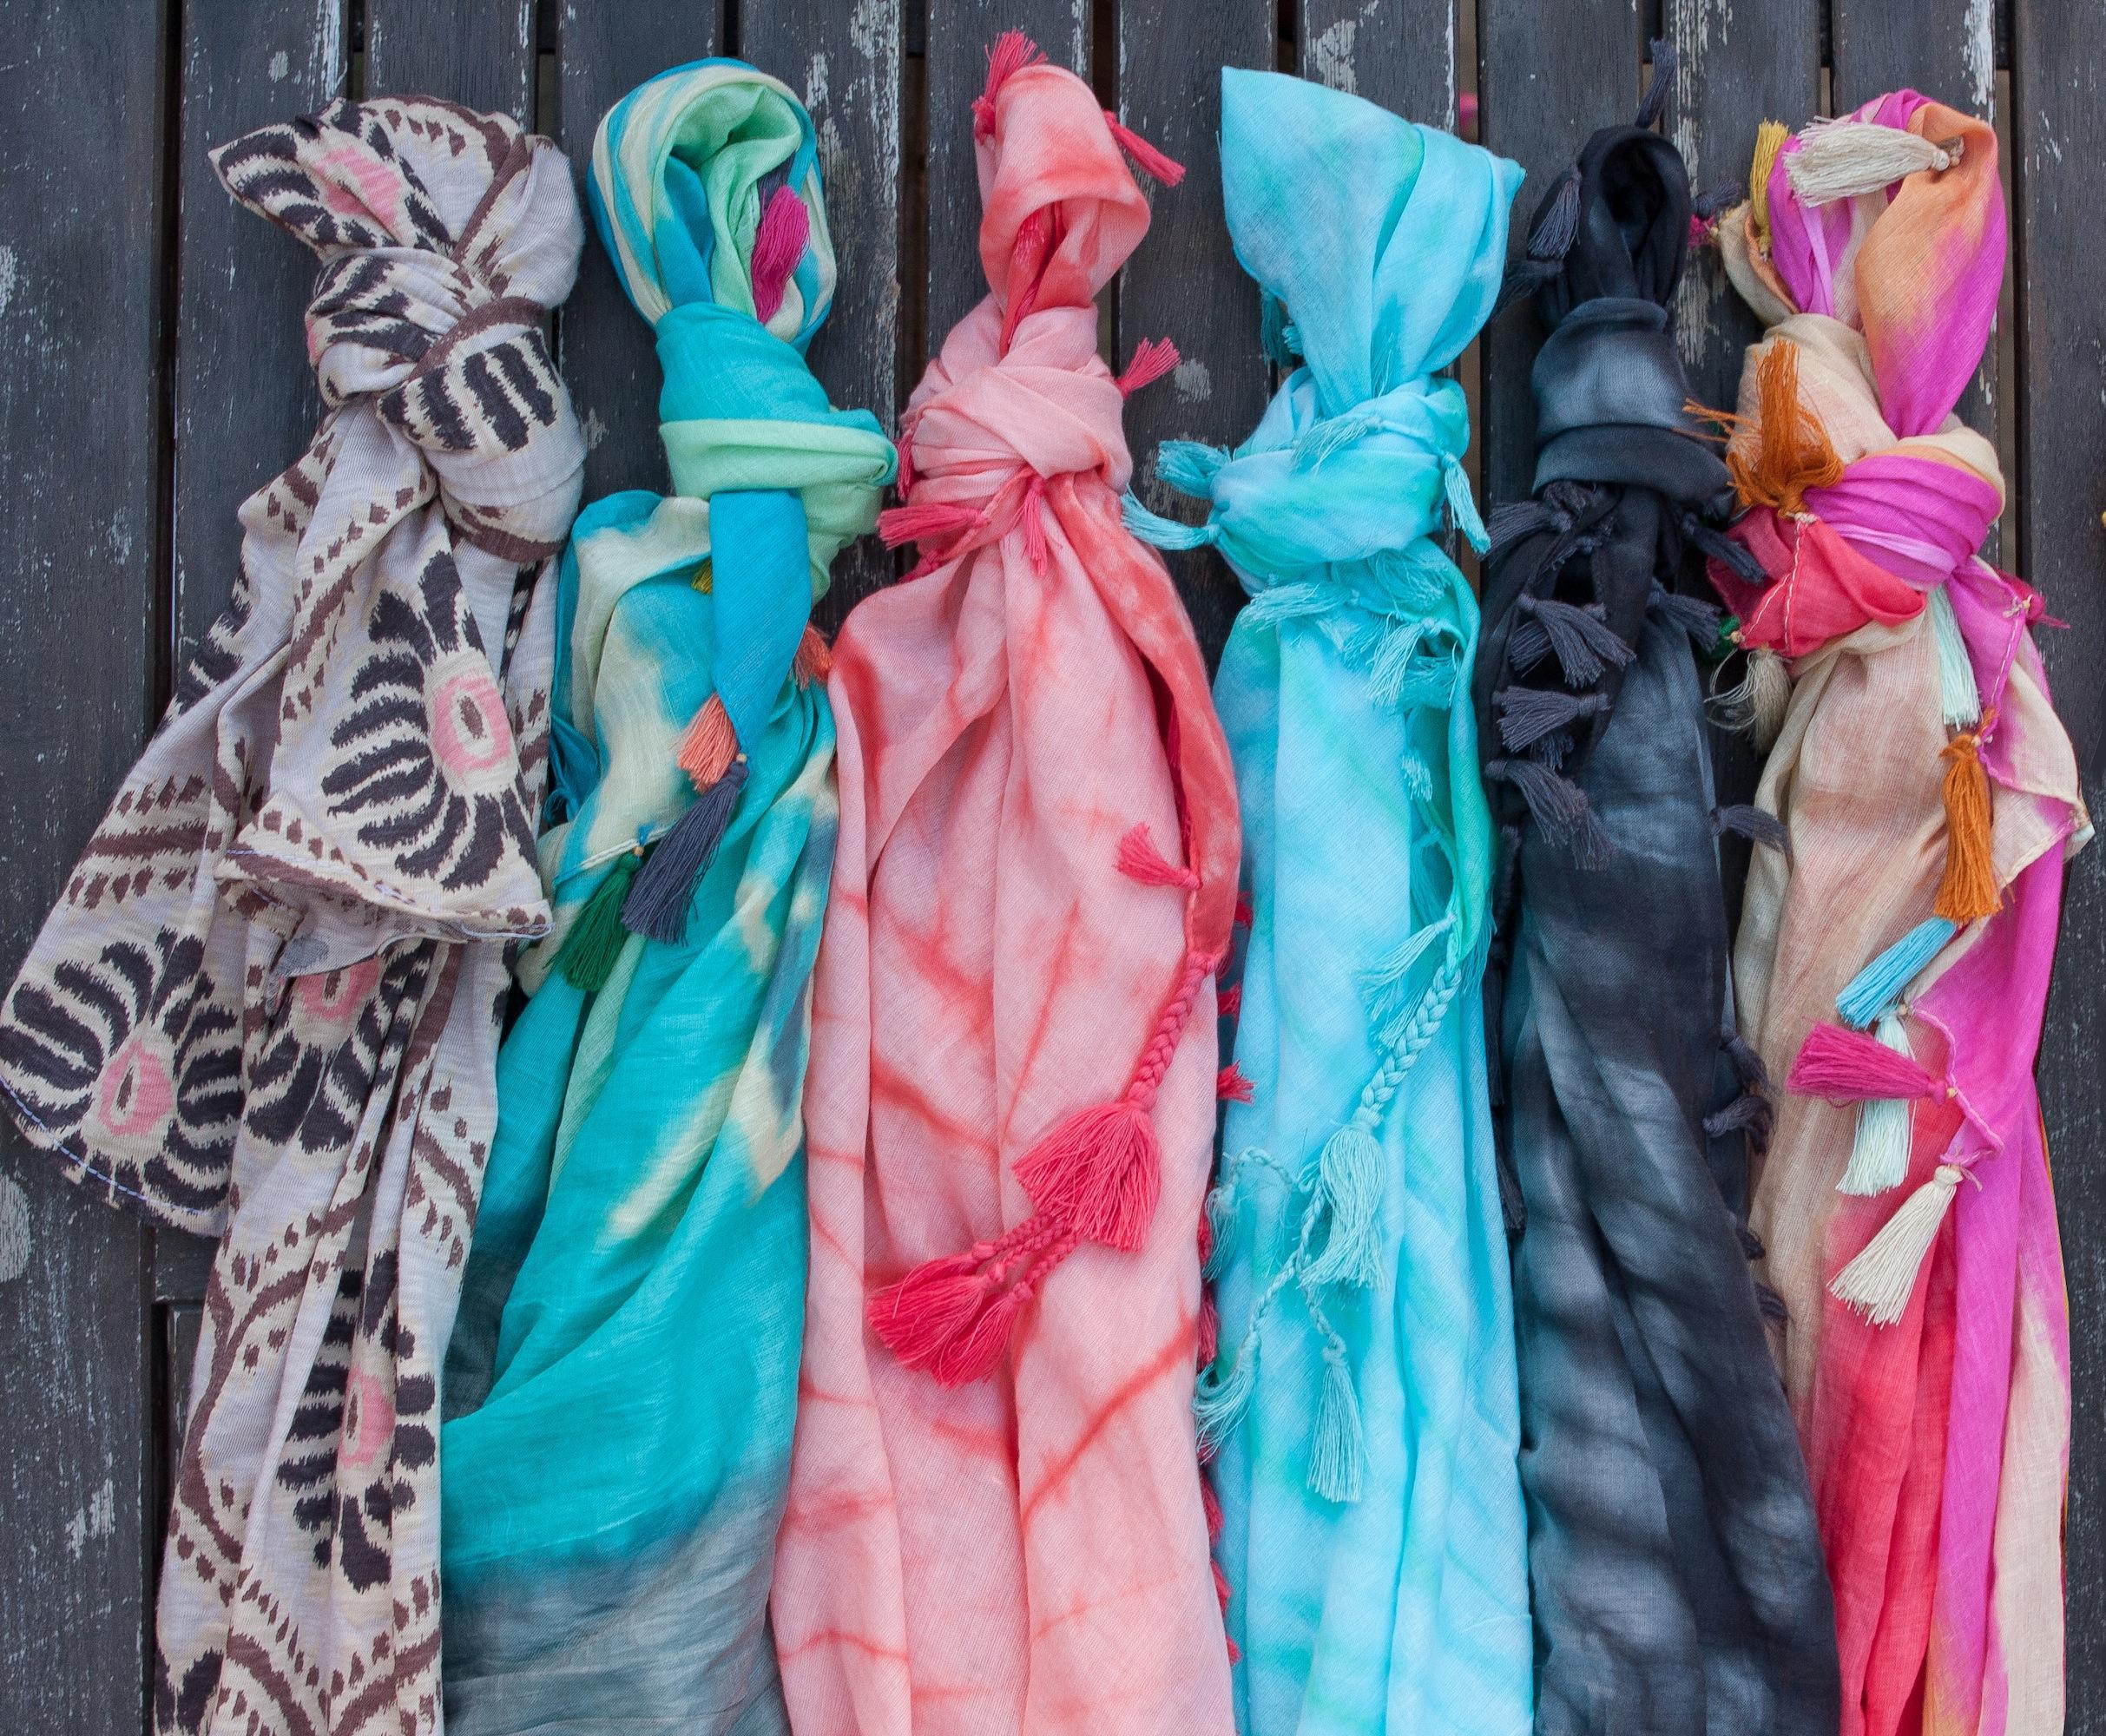 fresh produce unveils new original scarf designs